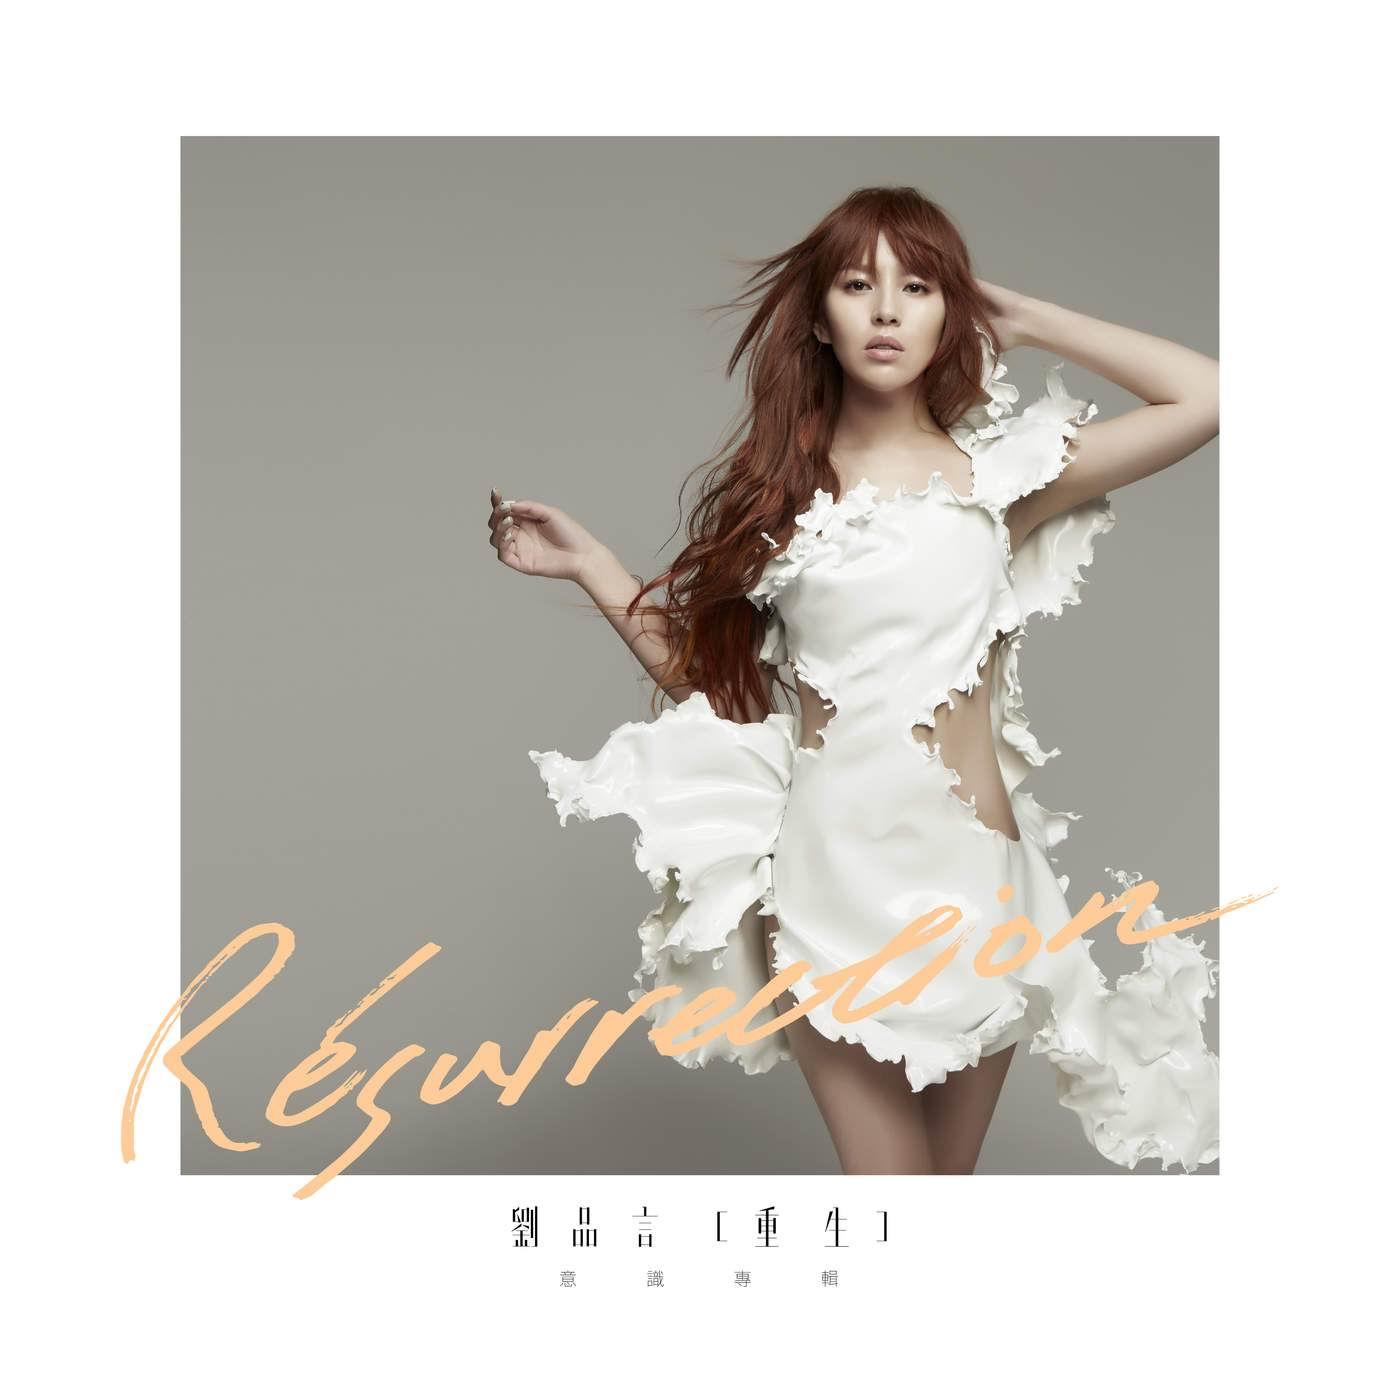 [Album] 重生 (Résurrection) - 劉品言 (Esther Liu)